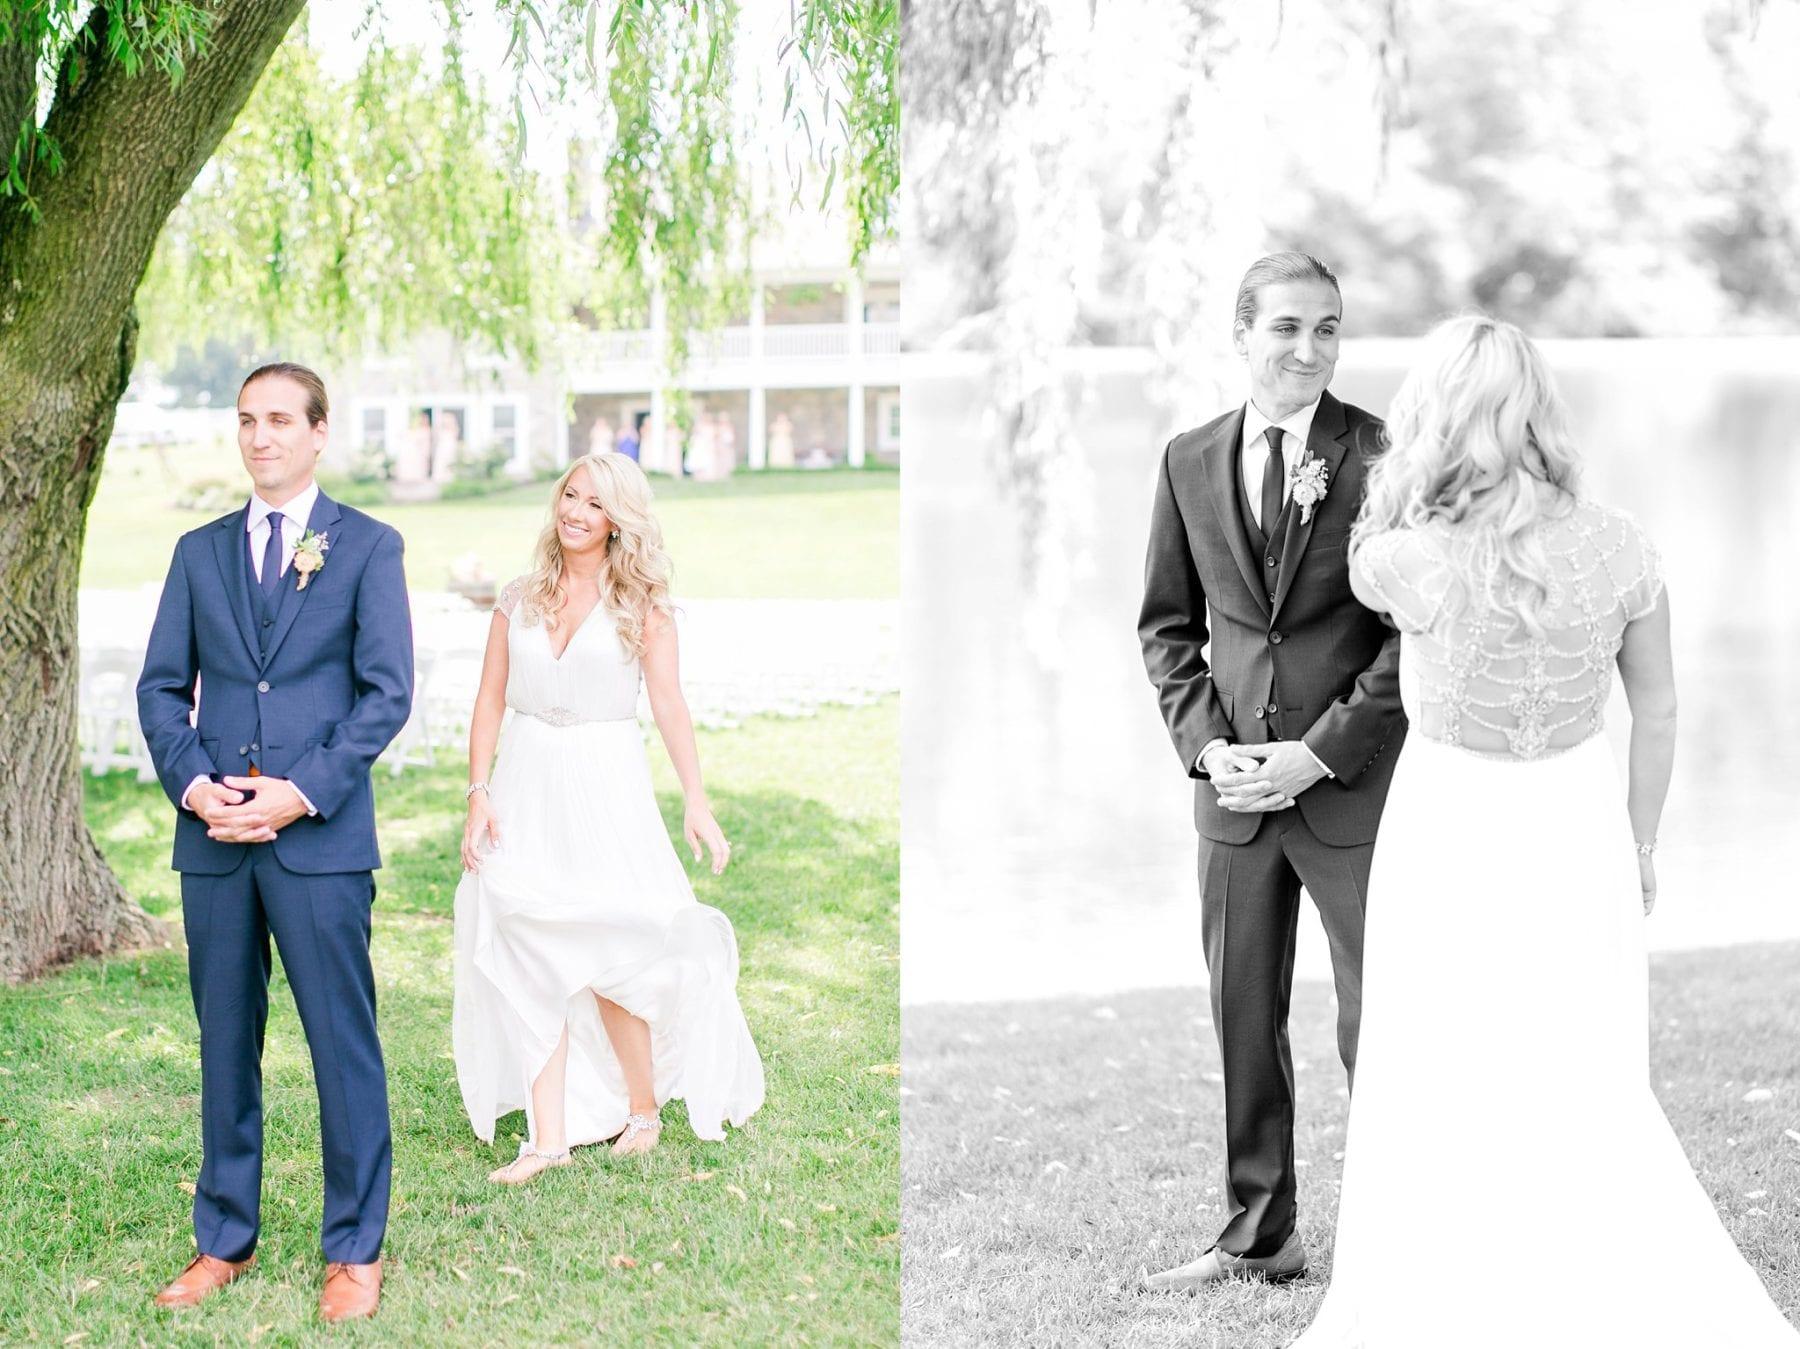 Pond View Farm Wedding Photos Maryland Wedding Photographer Kristen & Ryan Megan Kelsey Photography Blog-83.jpg